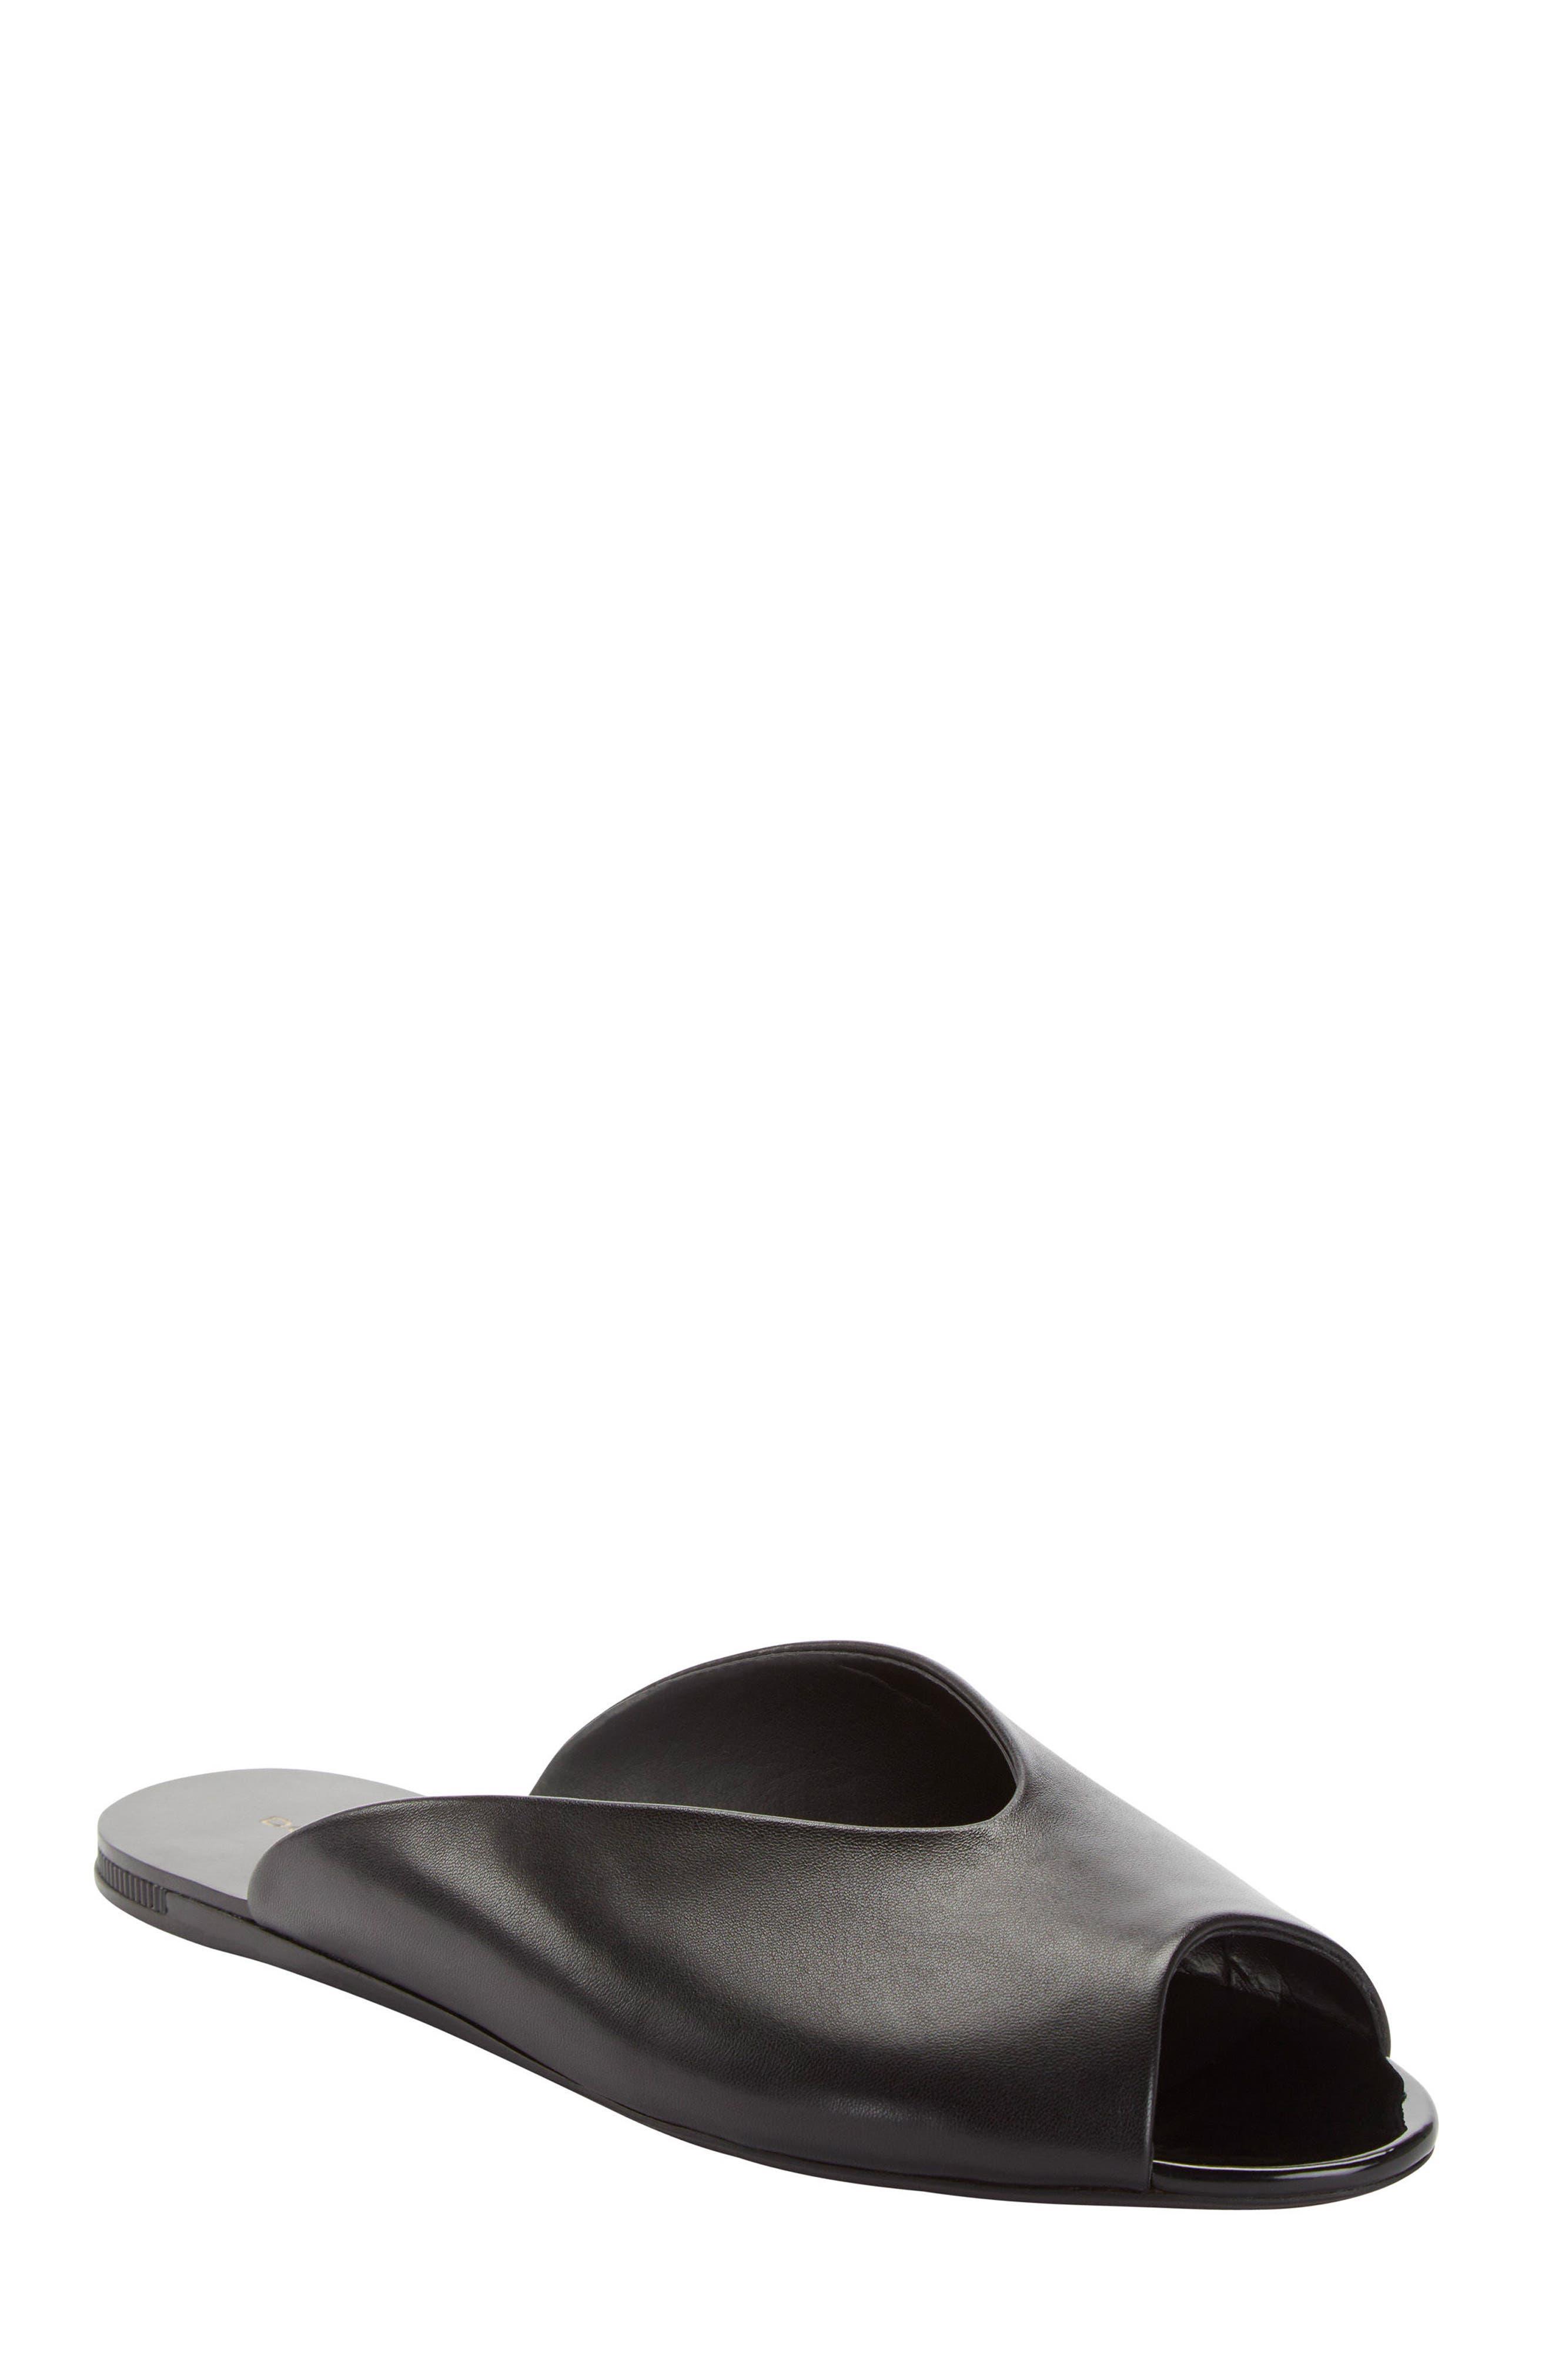 Donna Karan Zuzu Slide Sandal (Women)